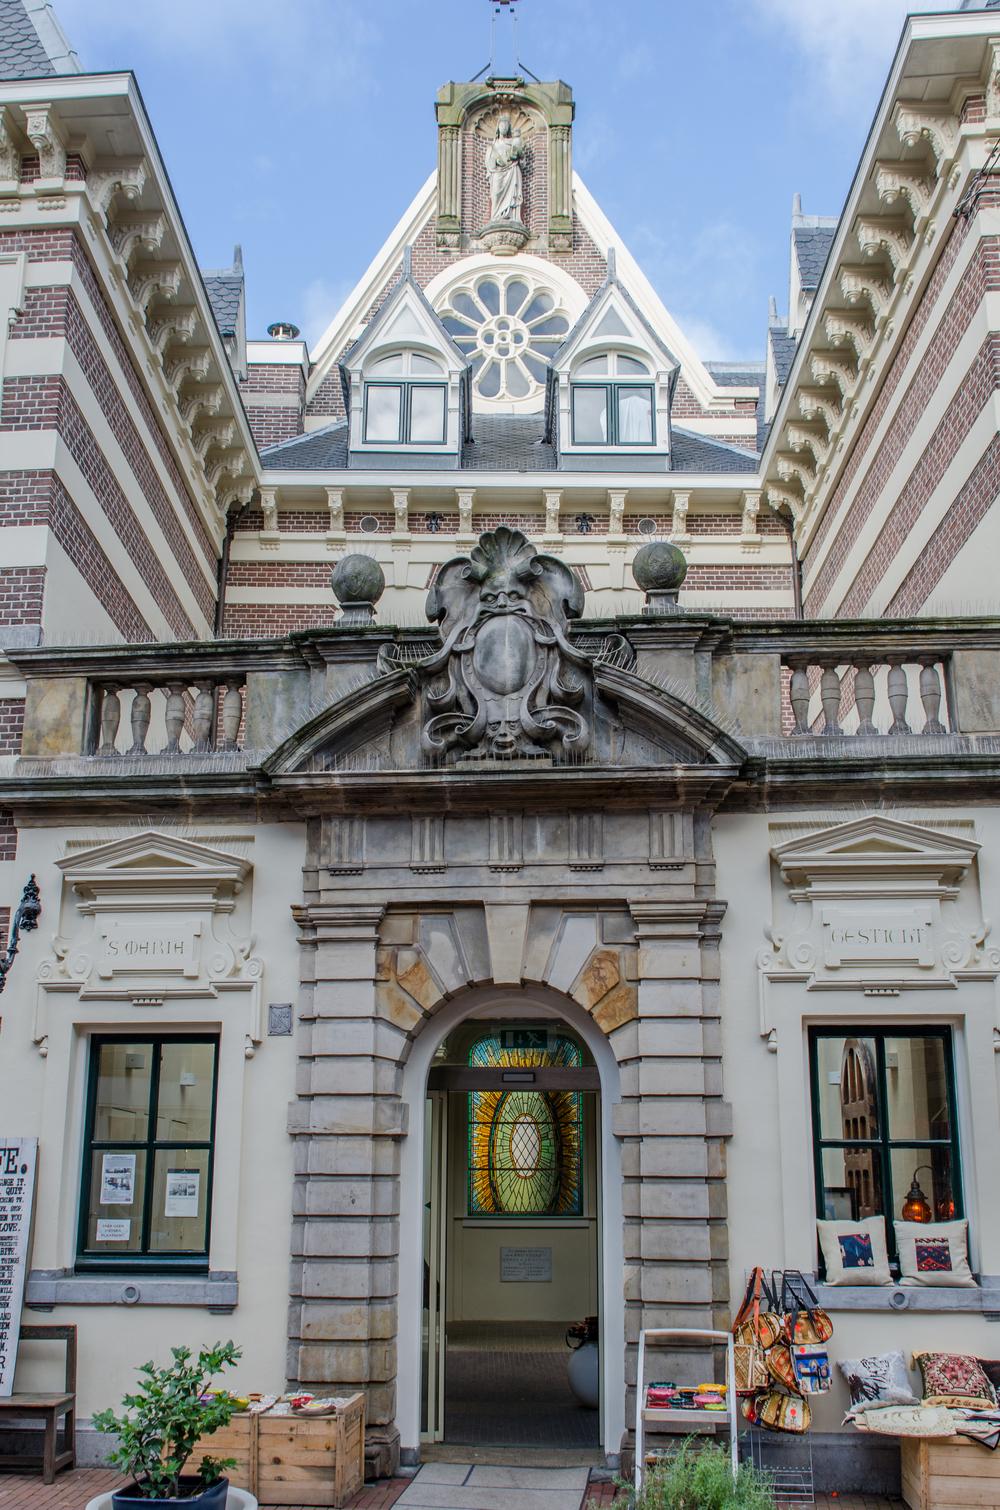 Haarlem-1.jpg